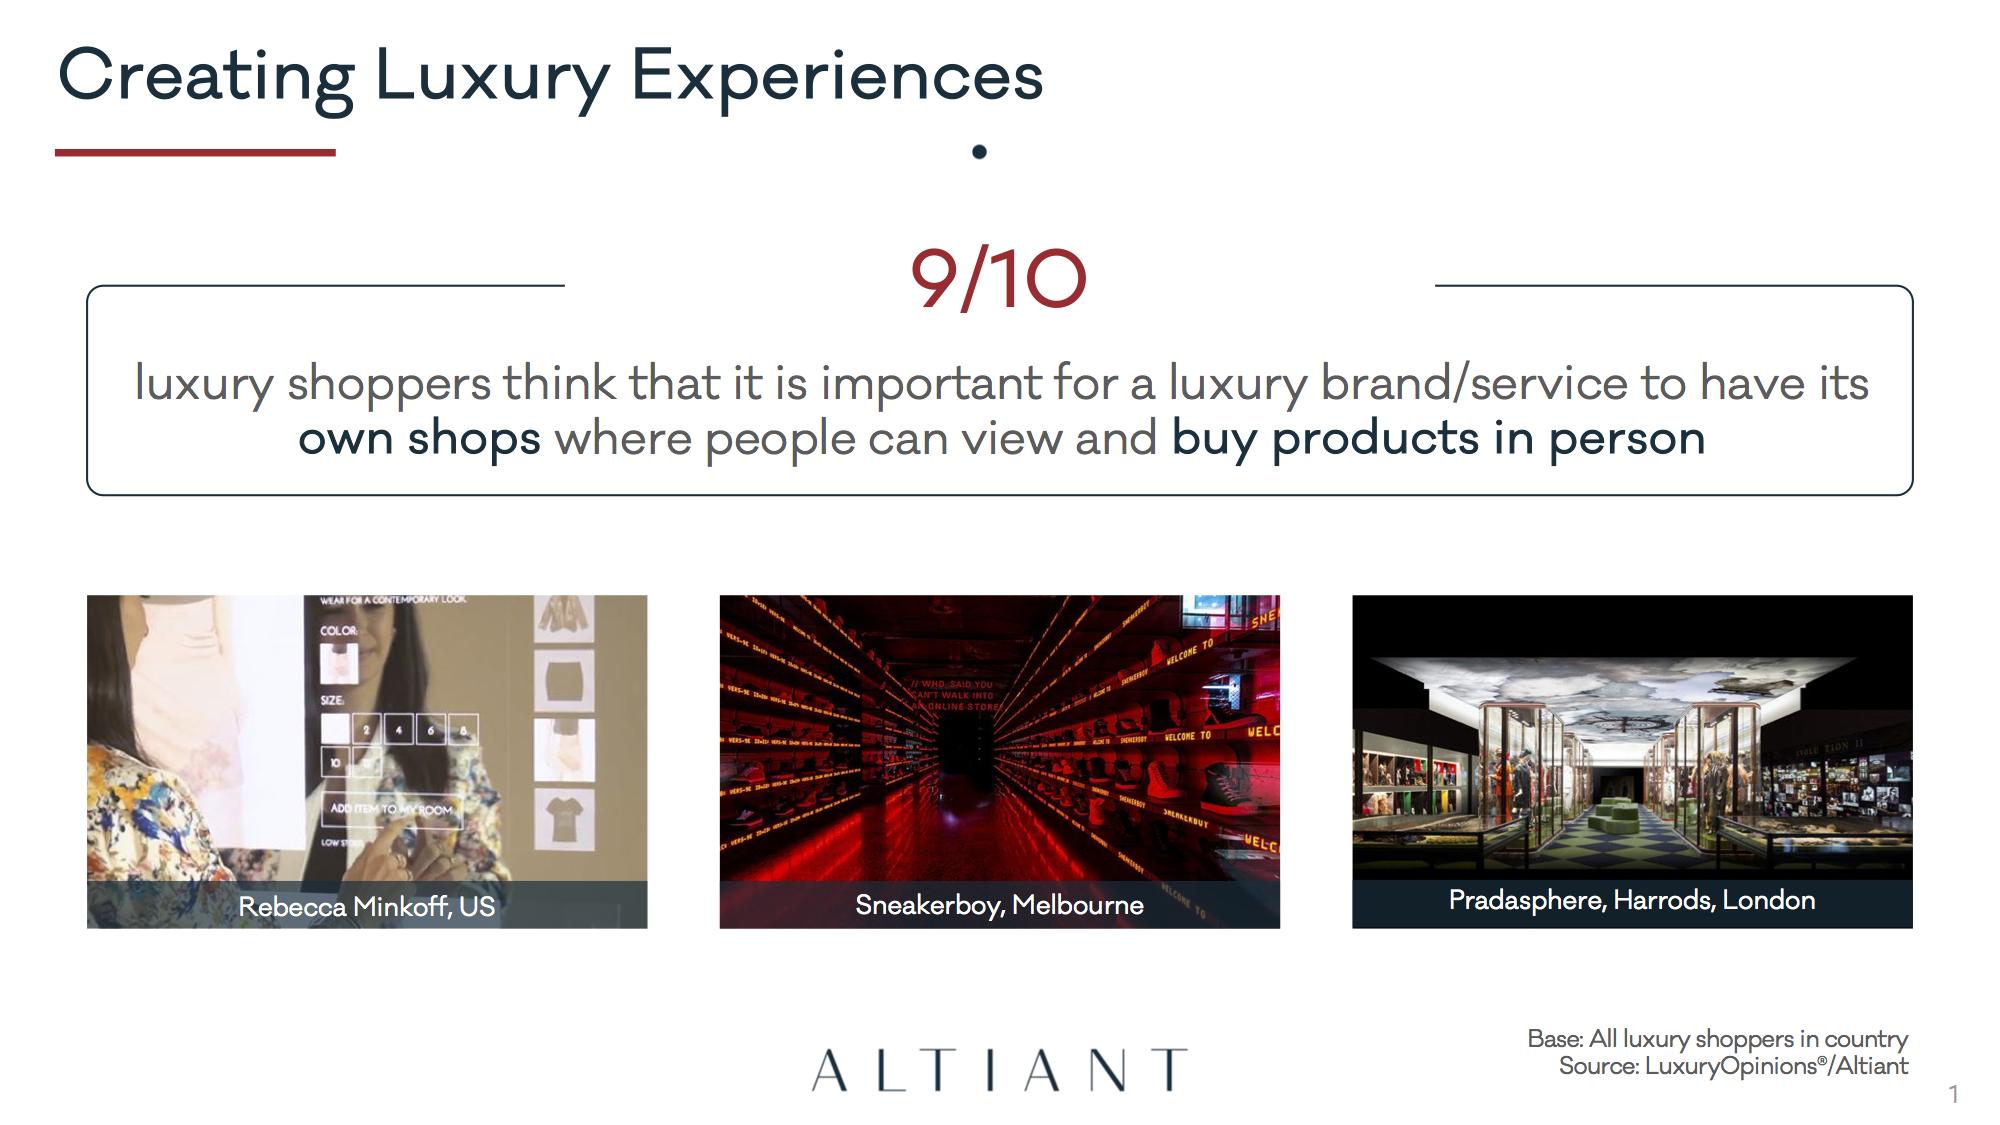 Altiant Key Luxury Trends p9 copy.png